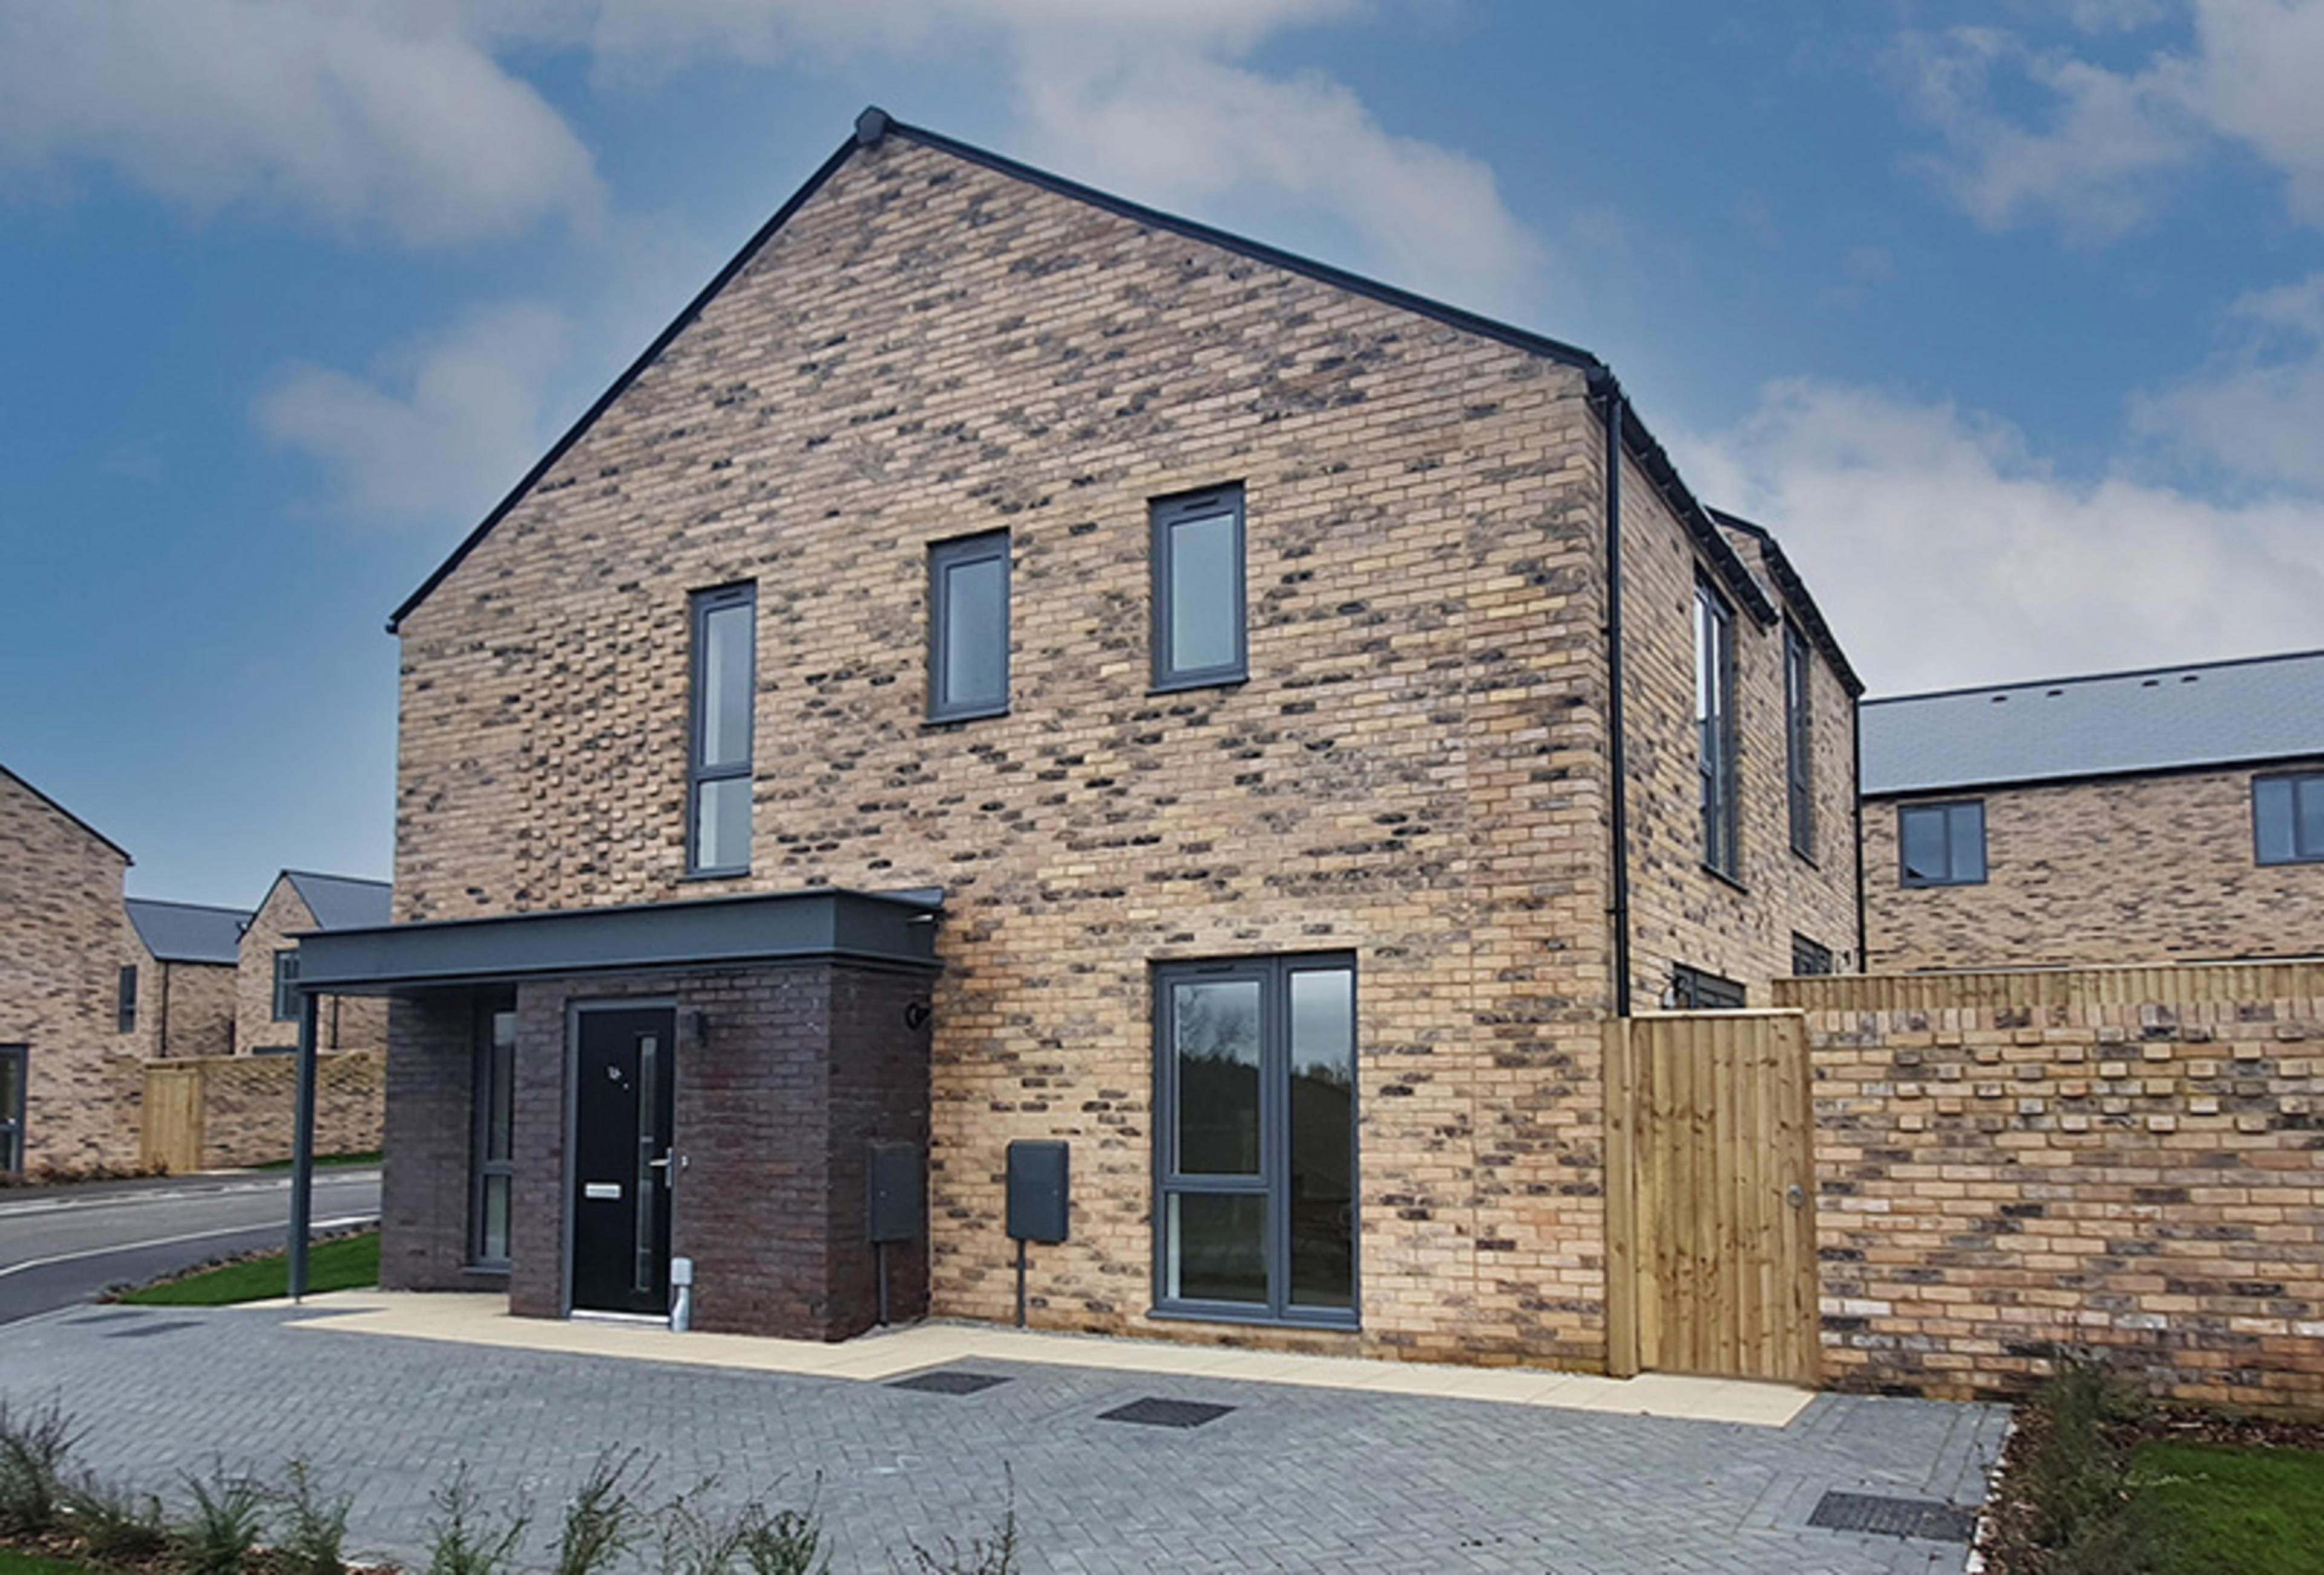 watling-grange-harrogate-coverham-3-bed-home-external